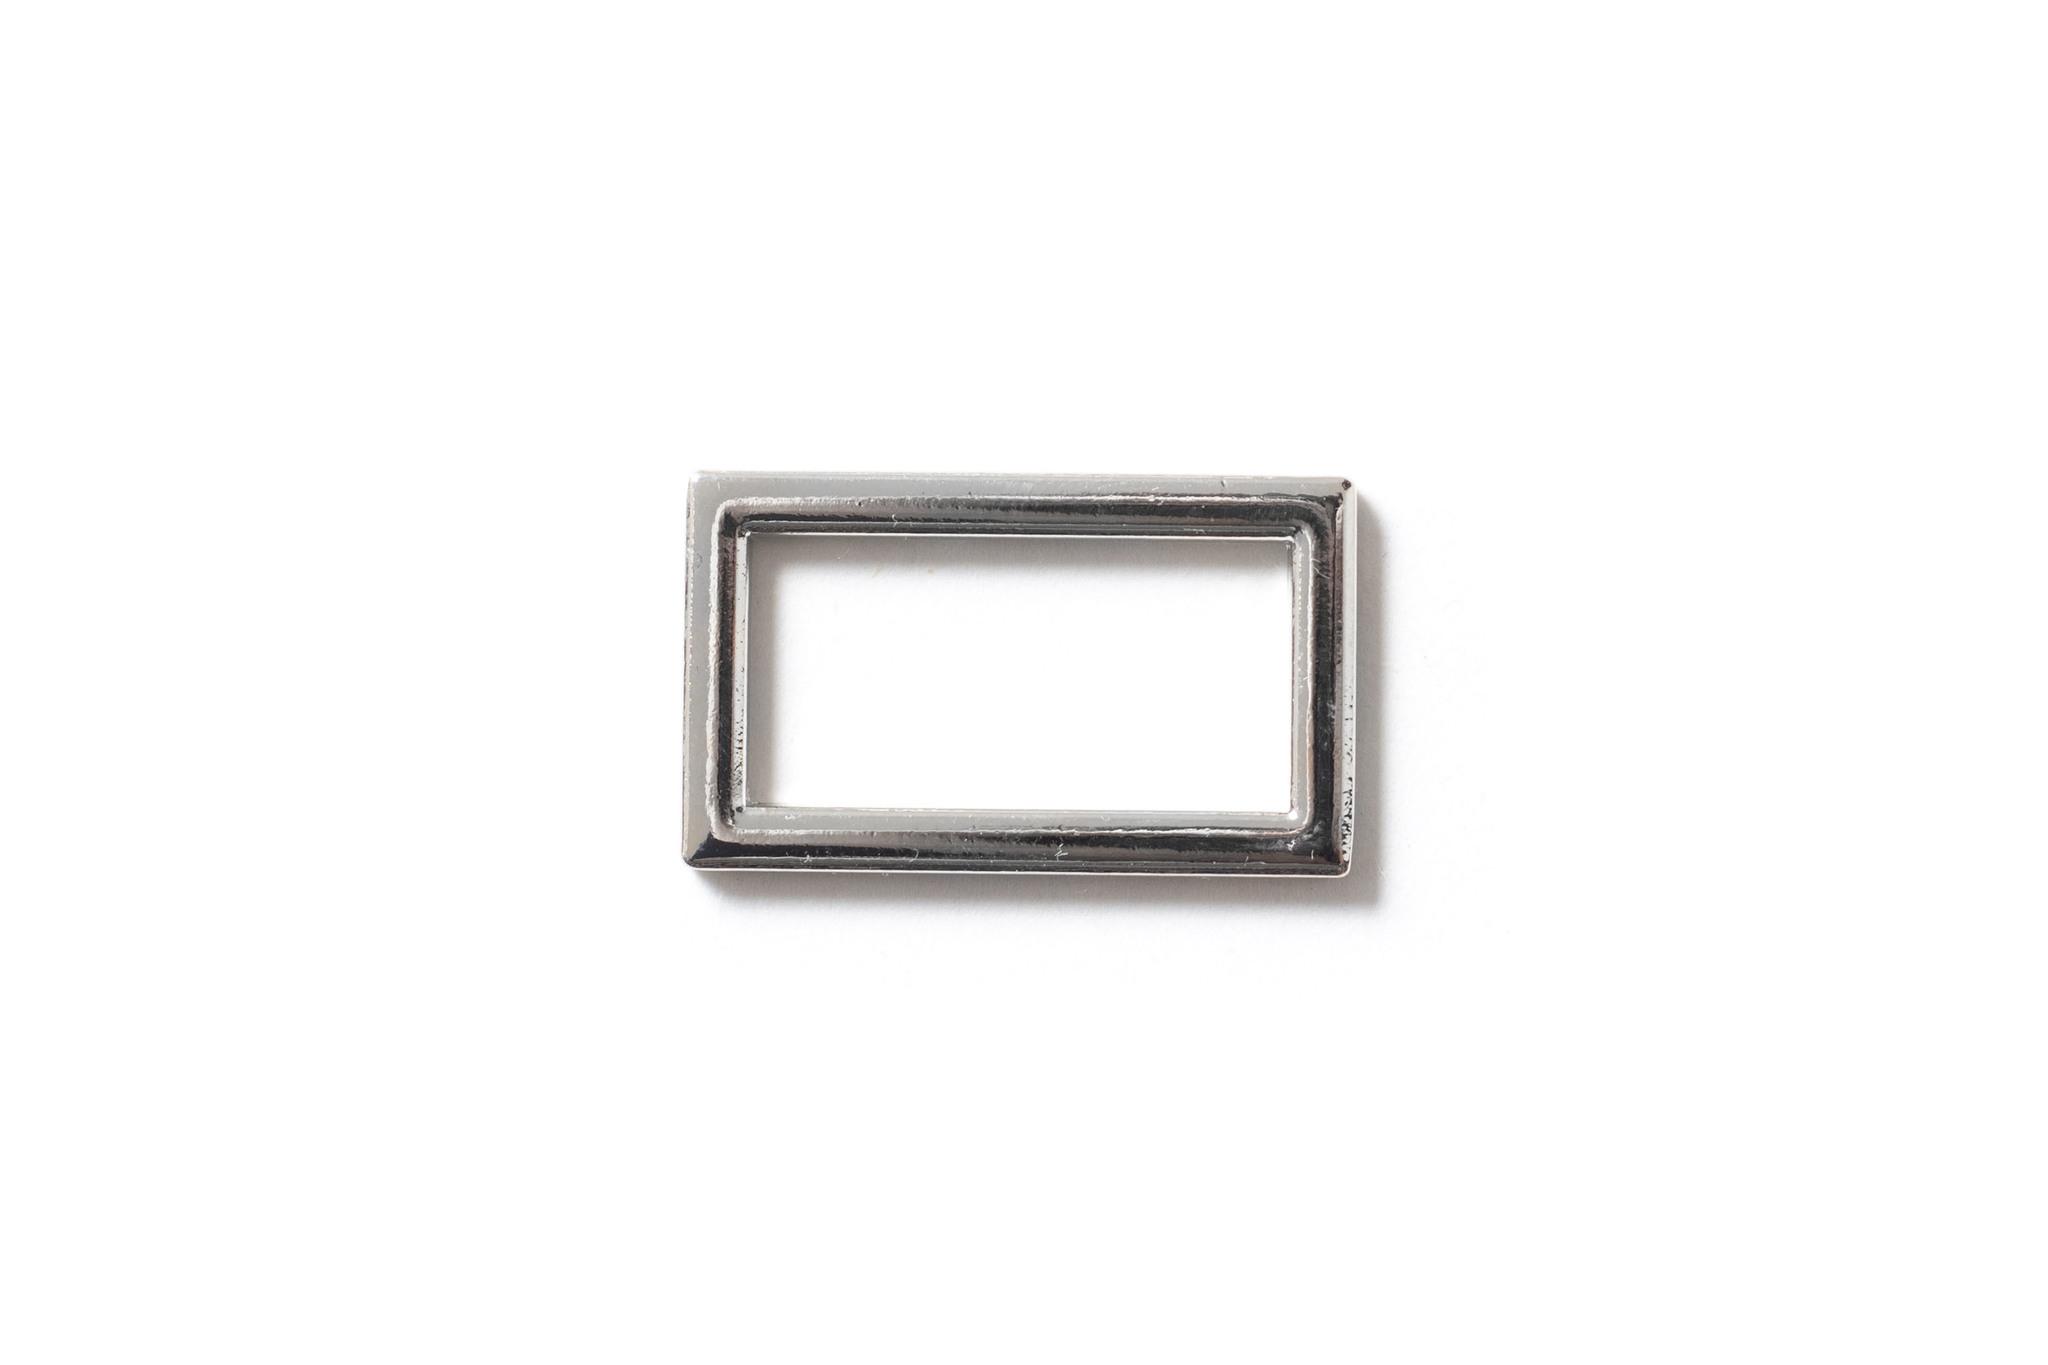 Металлическая рамка 11х25 мм, хром.